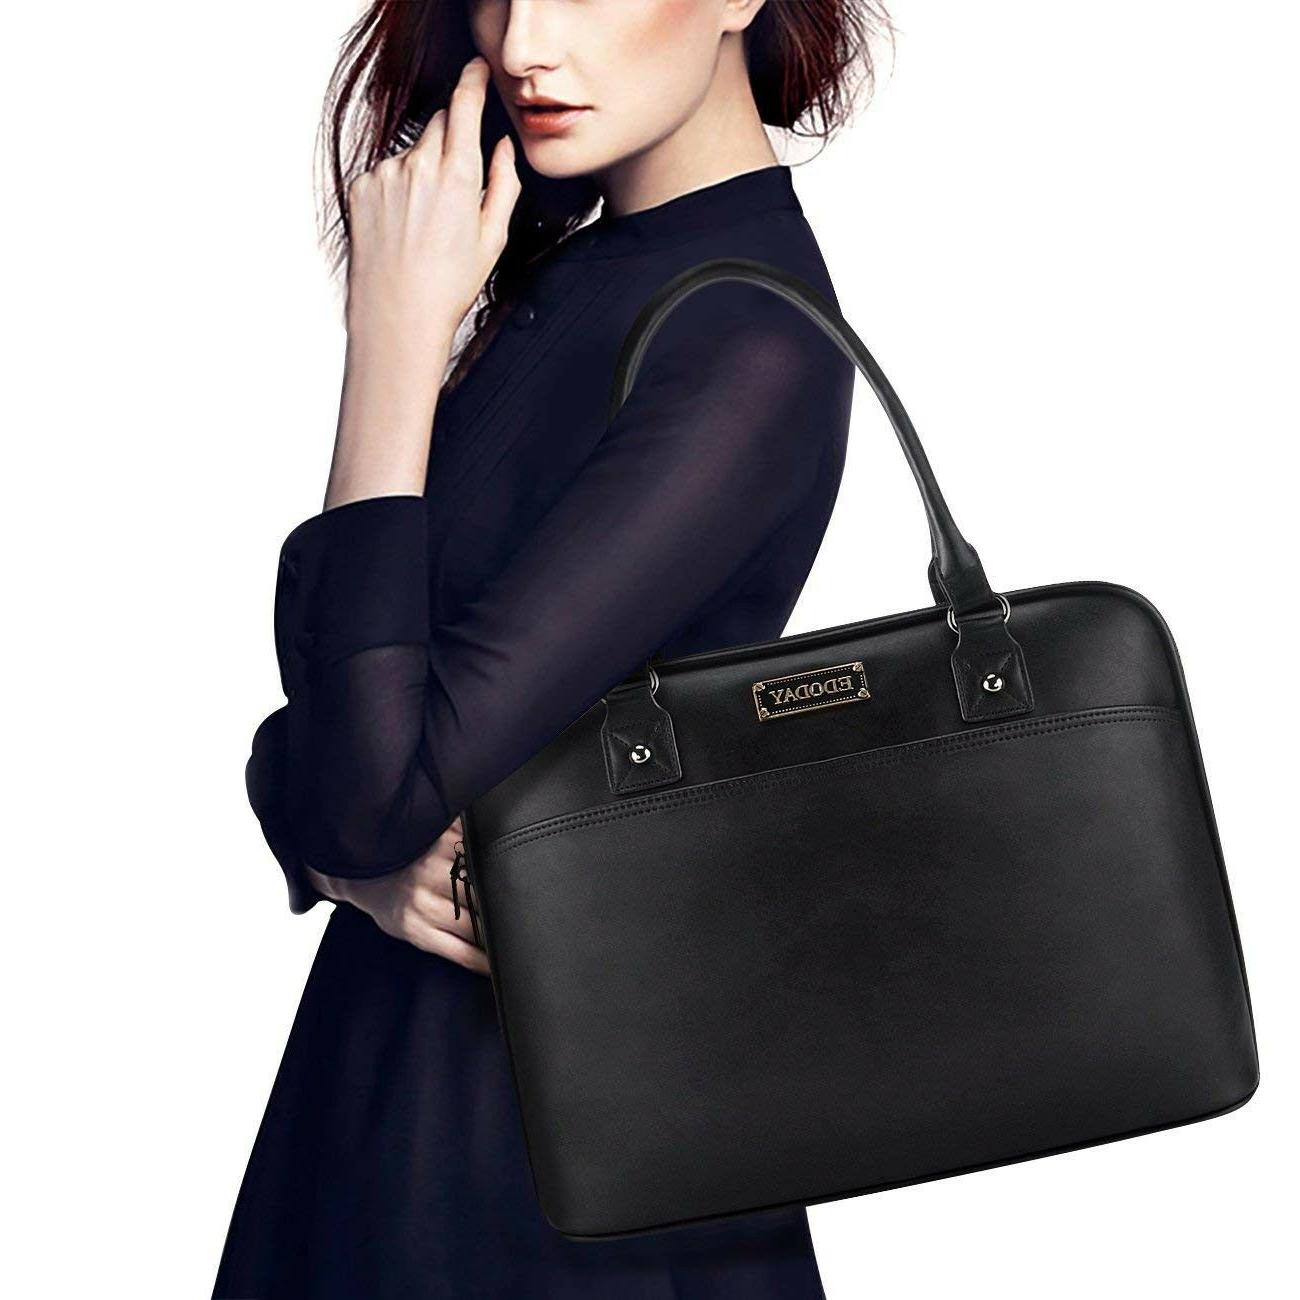 Laptop Bag,EDODAY Inch Women Shoulder Laptop Case fo